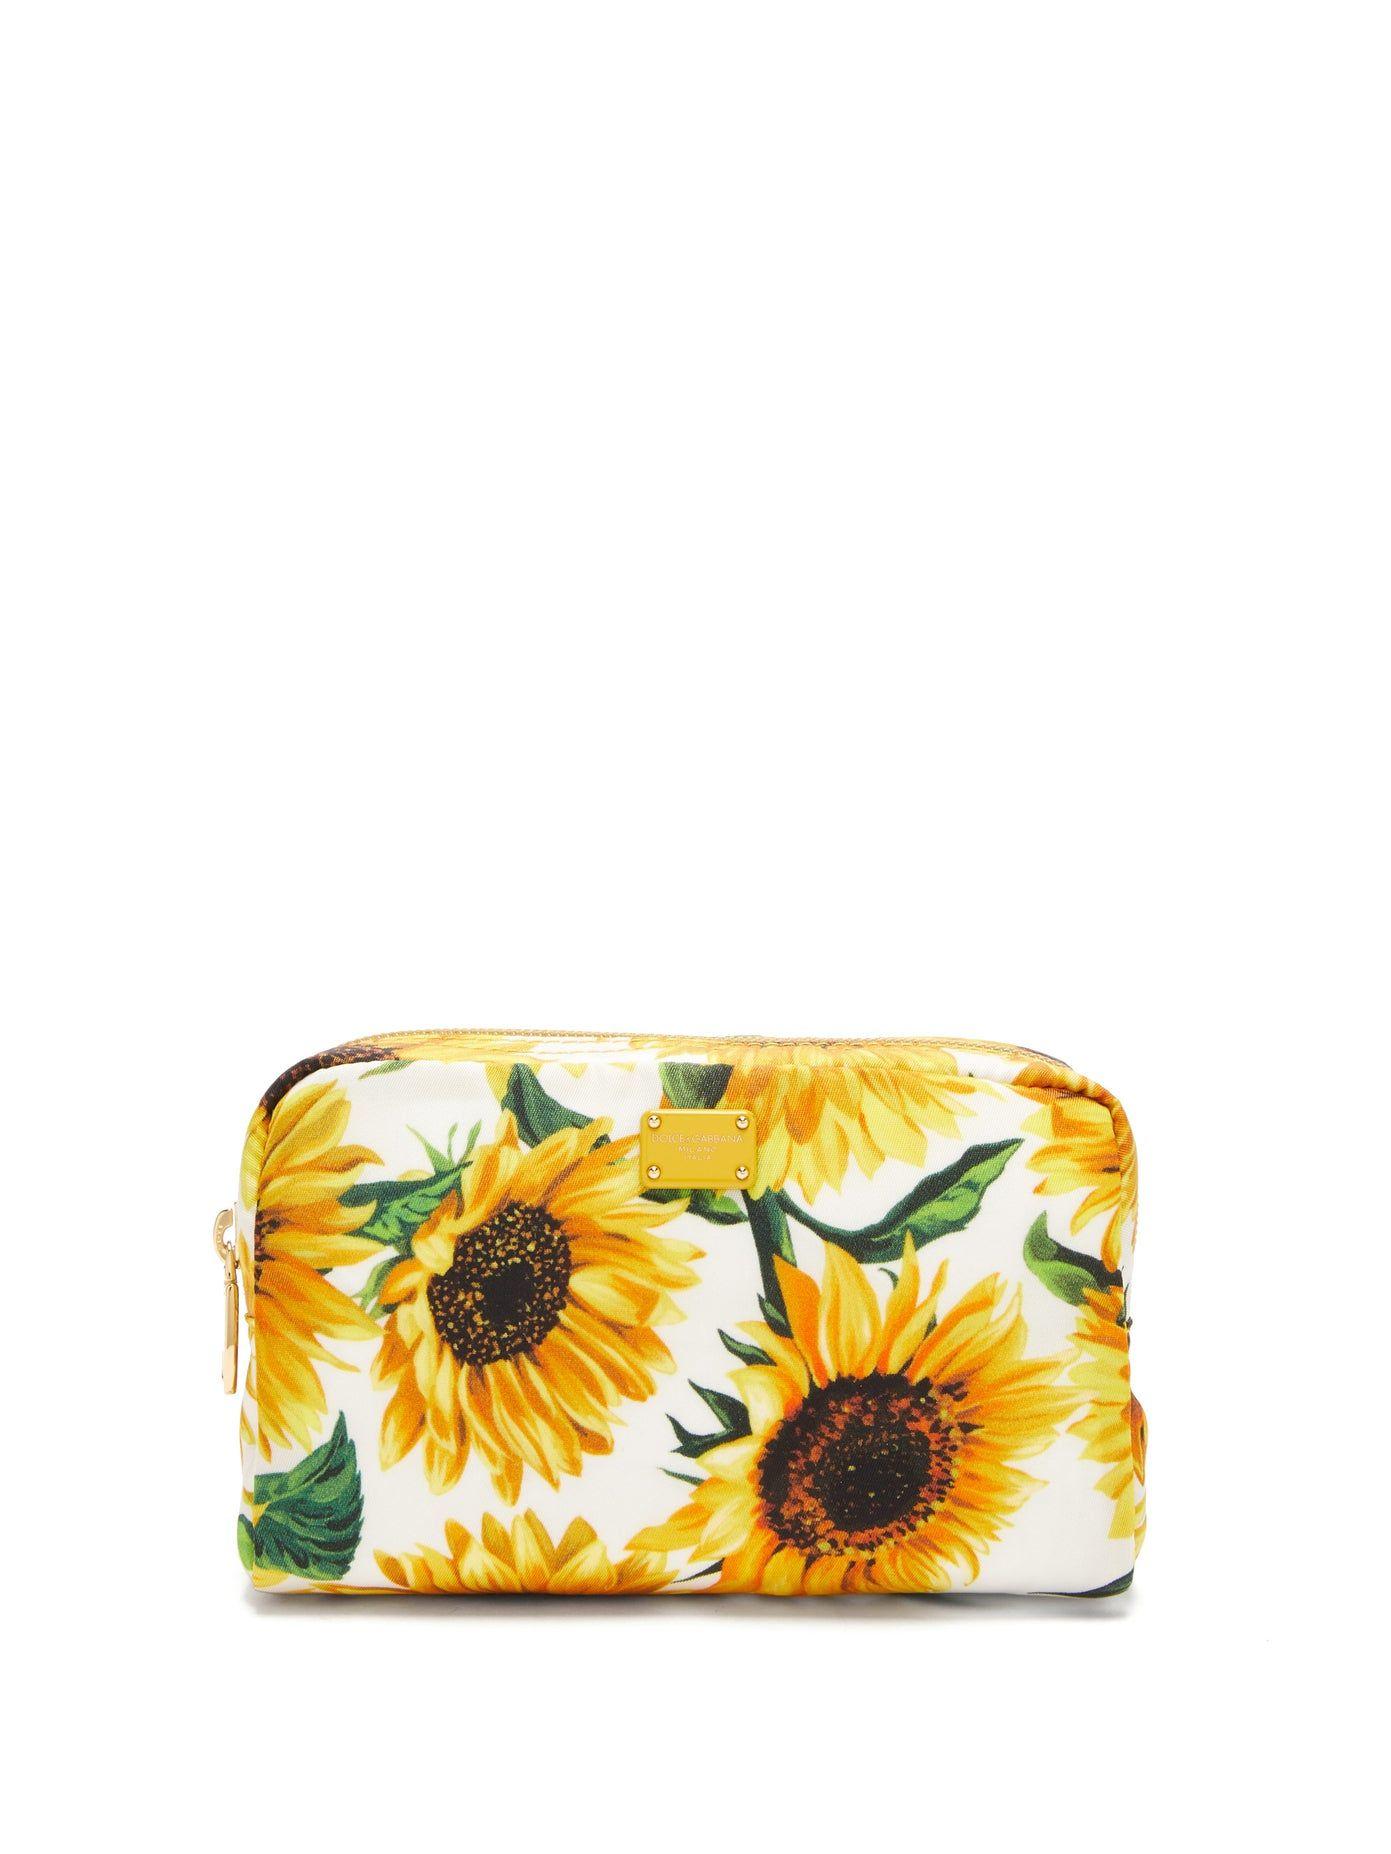 Sunflowerprint cosmetic case Dolce & Gabbana DG bags